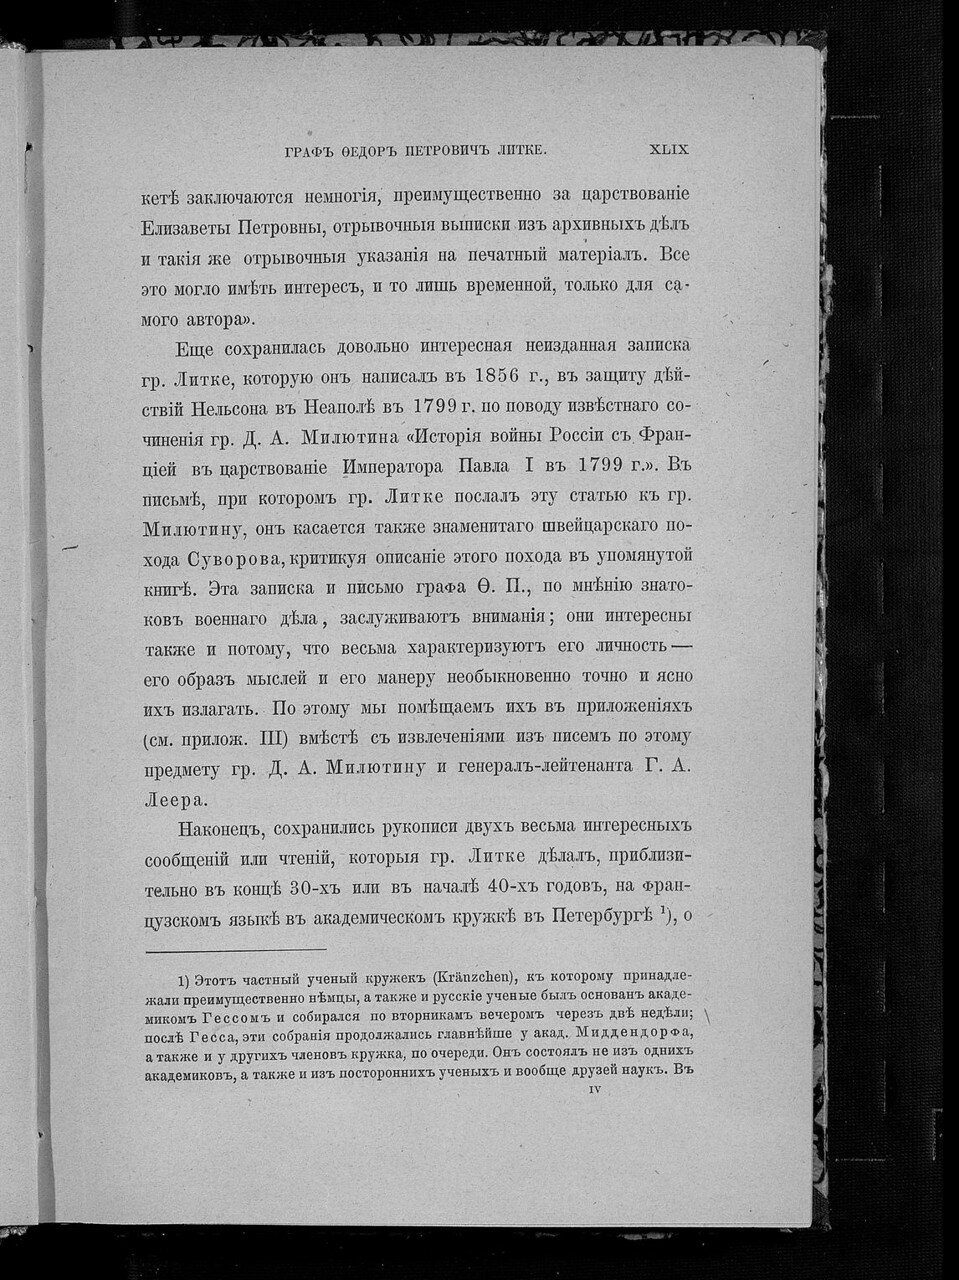 https://img-fotki.yandex.ru/get/770851/199368979.d3/0_21dd83_cdd3d3bb_XXXL.jpg